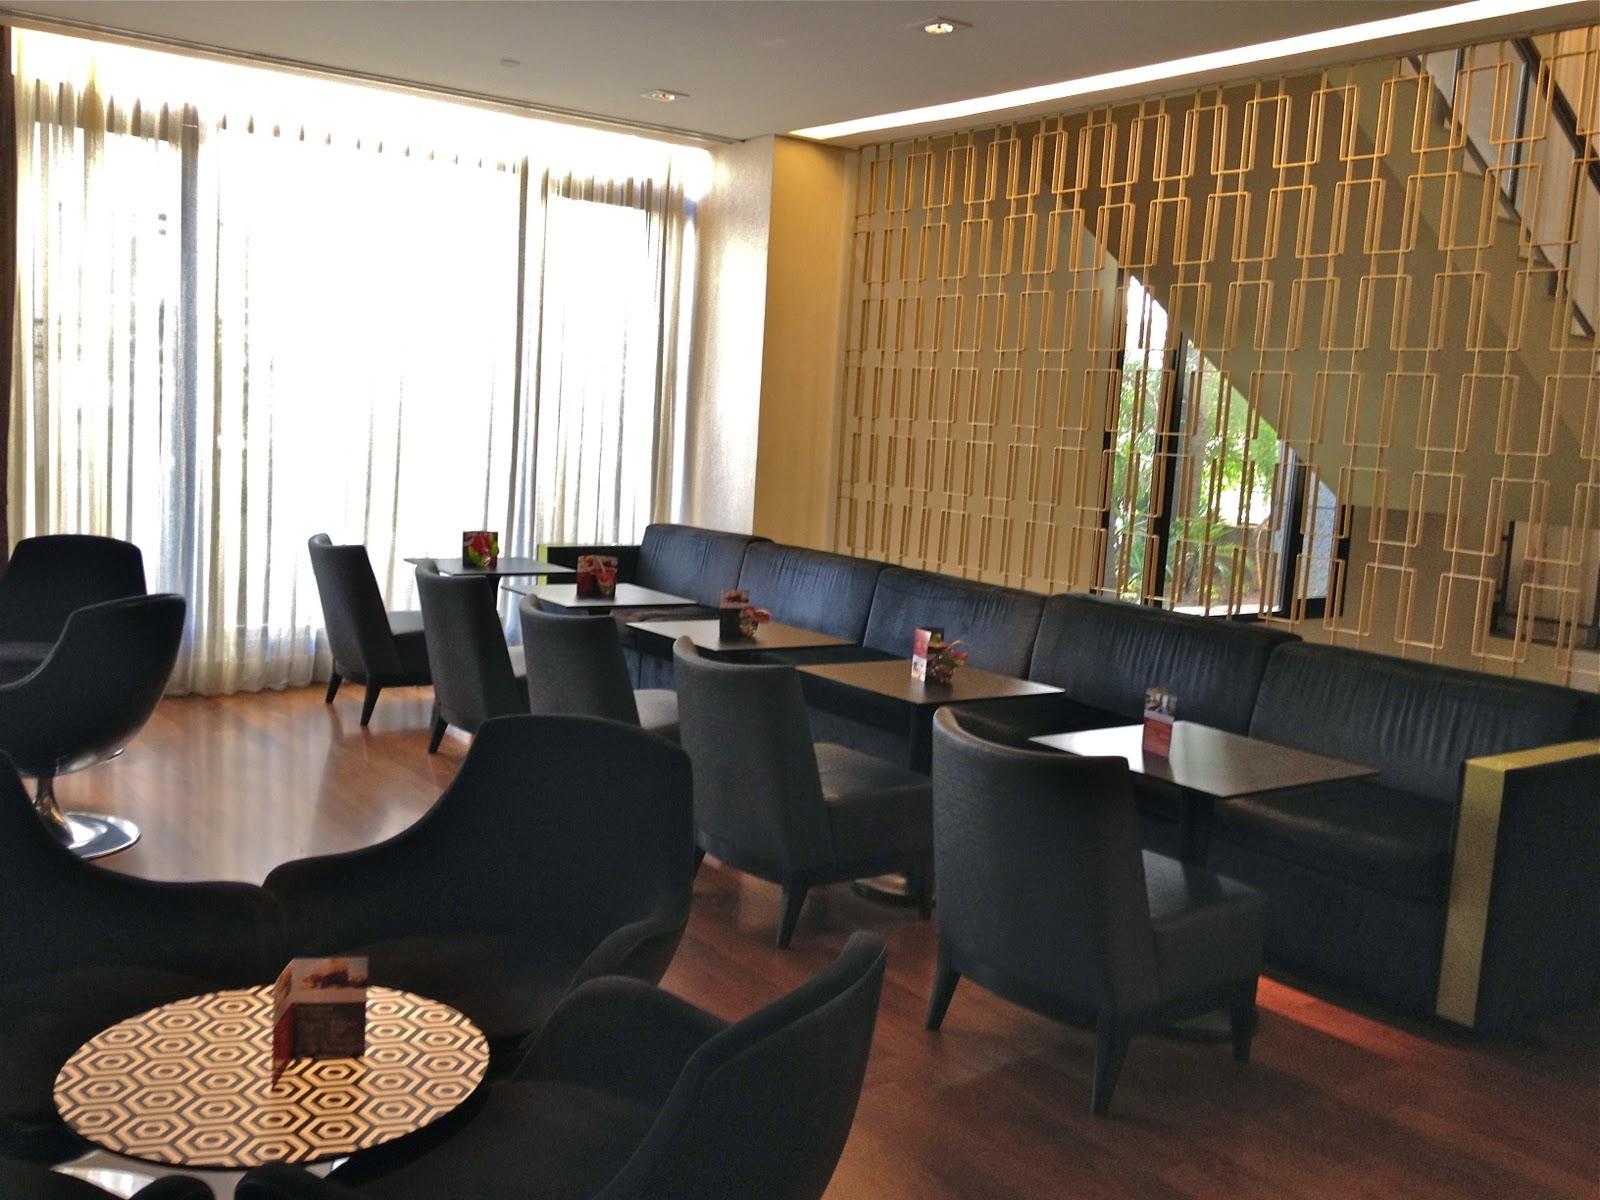 Intercontinental Meeting Rooms